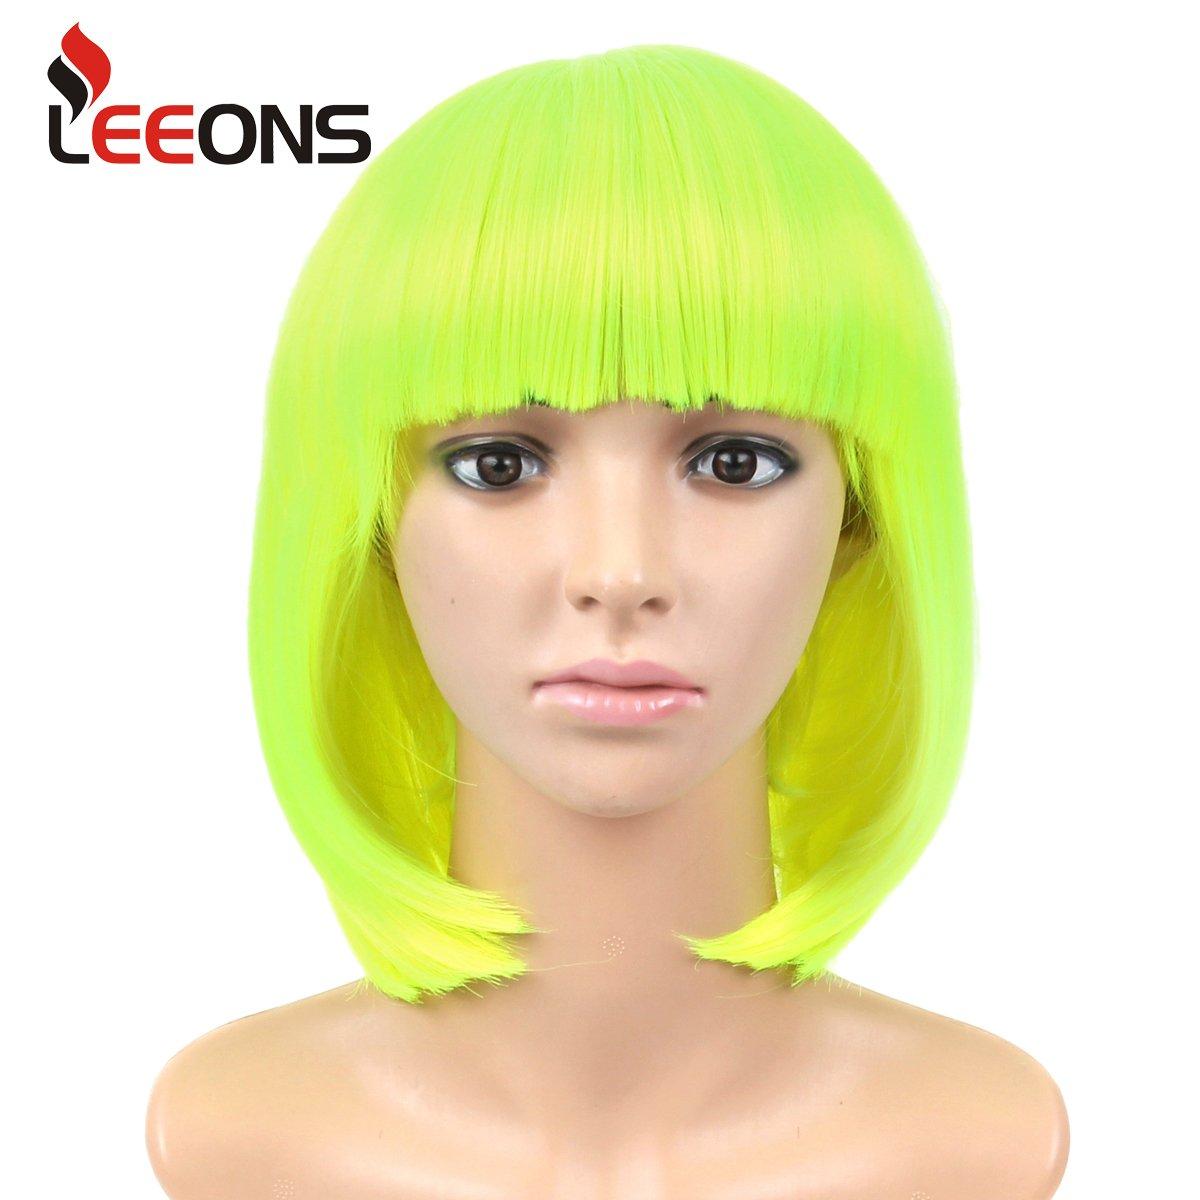 LEEONS 12'' Neon Green Short Straight Bob Hair Full Wigs Cosplay Party Anime Kanekalon Synthetic Fiber Natural Looking Wigs